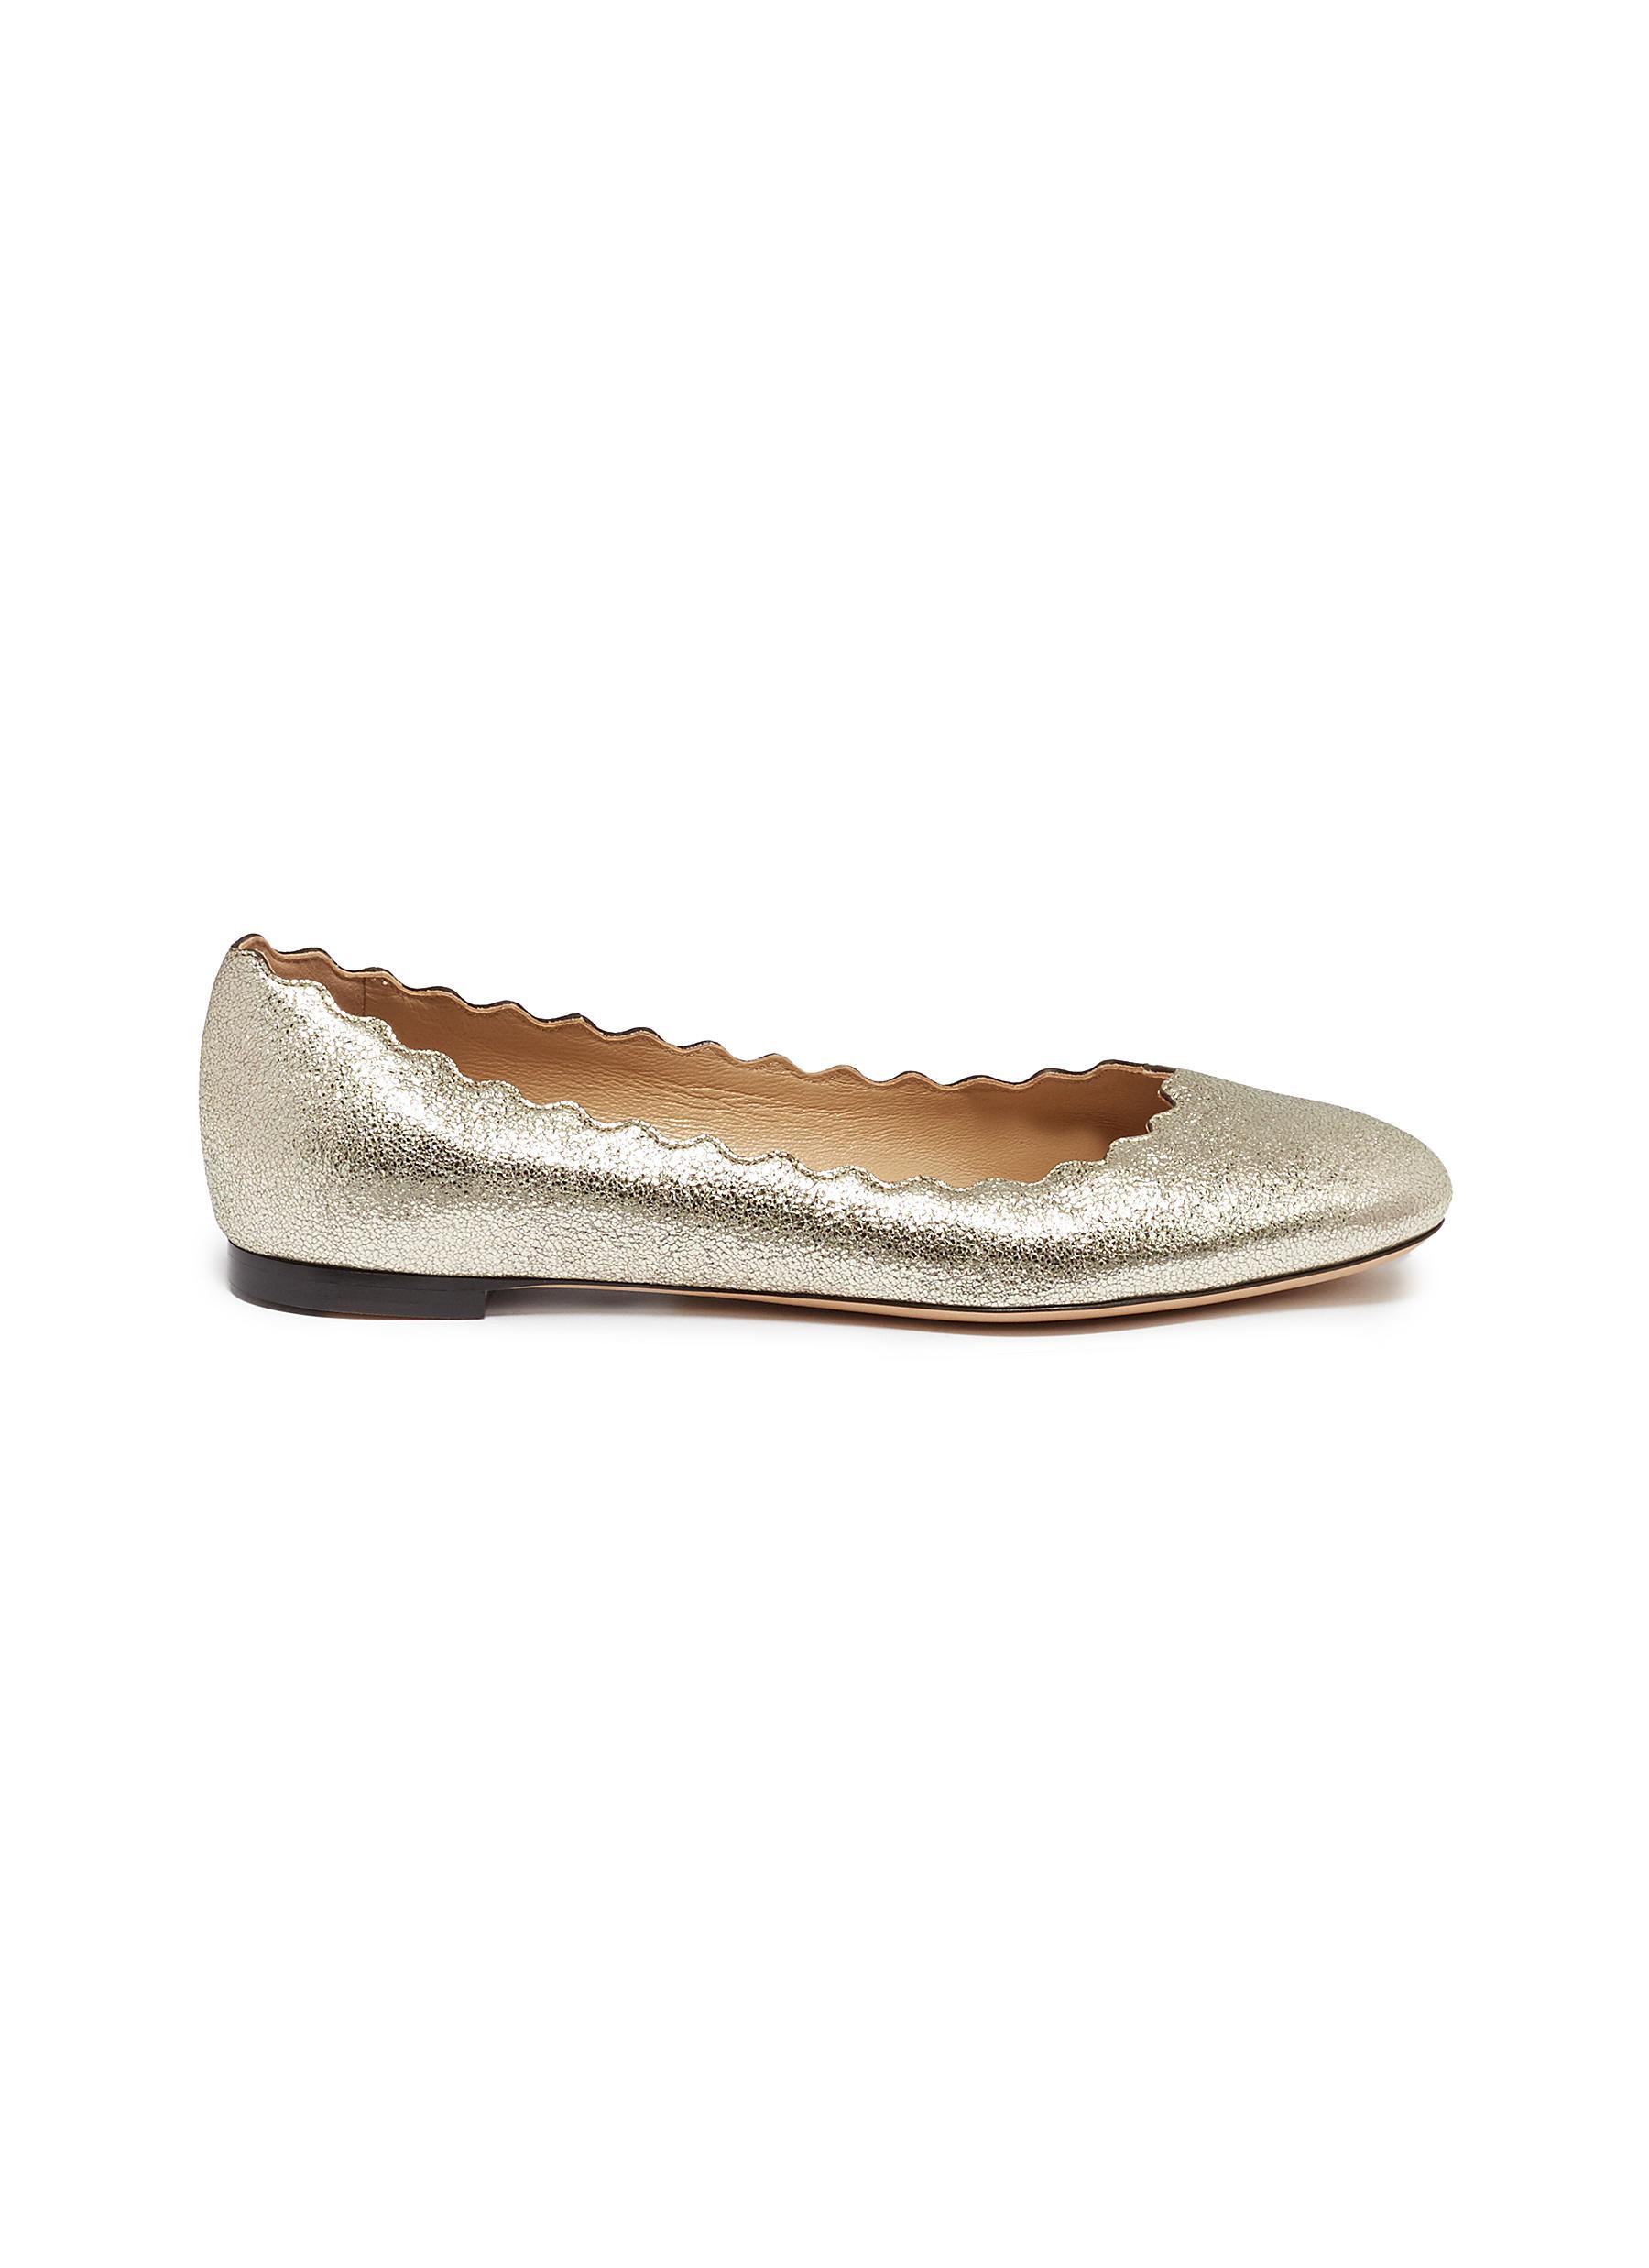 624932335a3c Chloé.  Lauren  scalloped metallic leather ballet flats